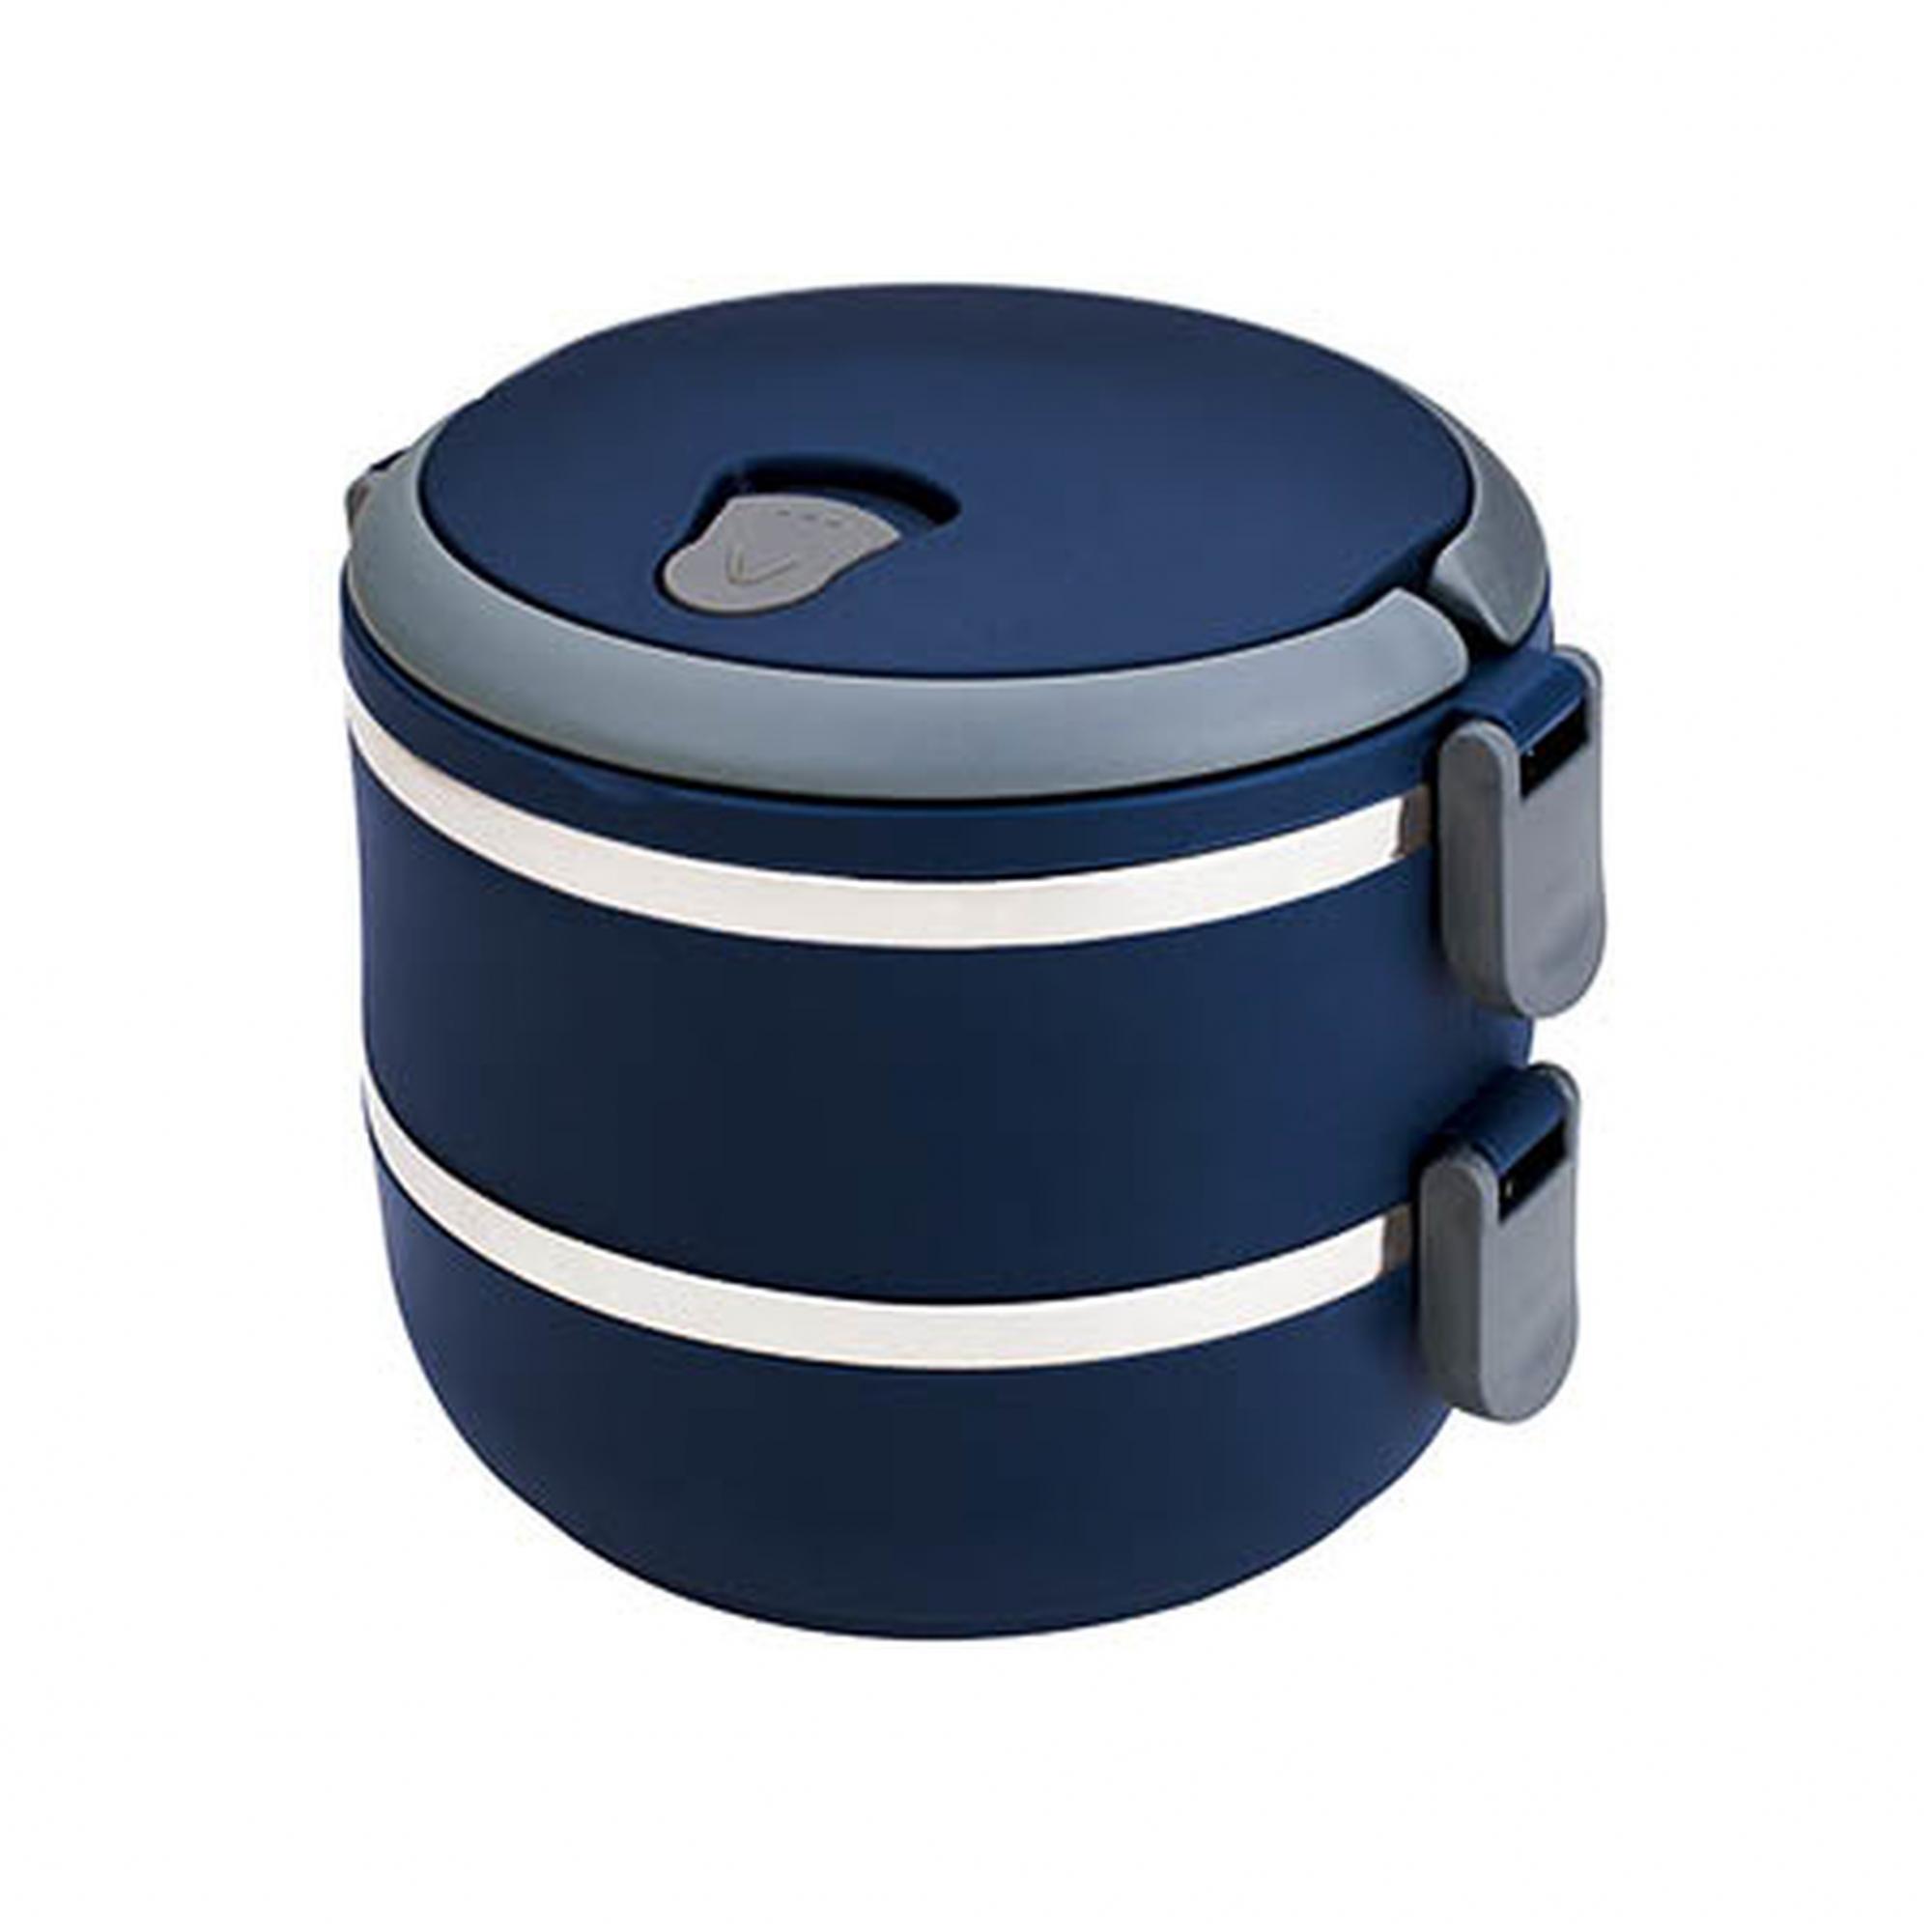 Lunch Box Marmita Dupla Azul 1,4L Euro Home